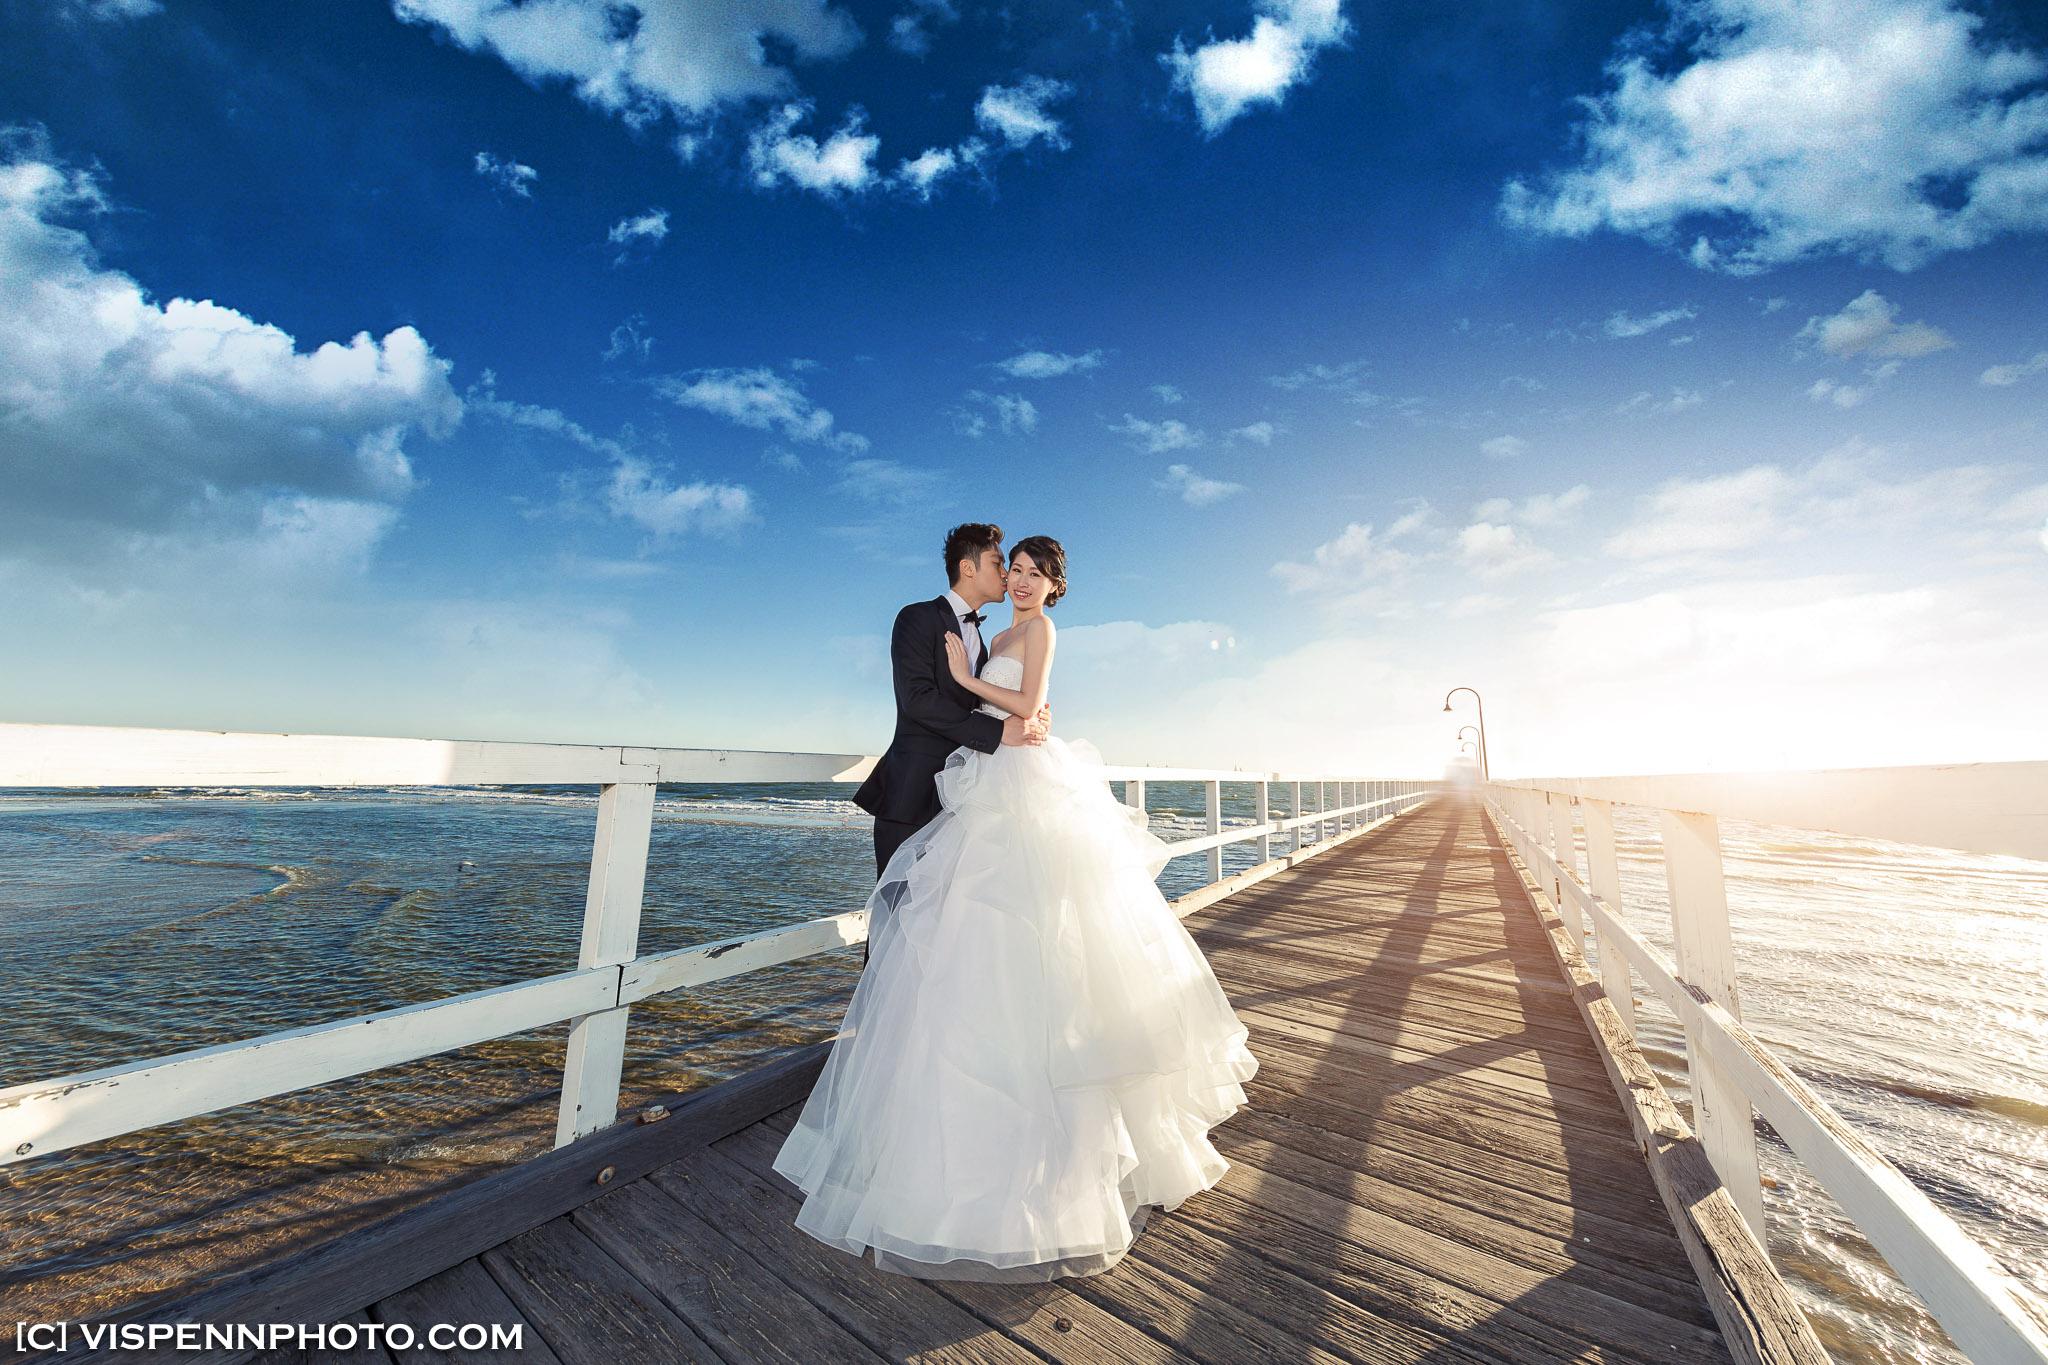 PRE WEDDING Photography Melbourne VISPENN 墨尔本 婚纱照 结婚照 婚纱摄影 VISPENN Cindi 2233